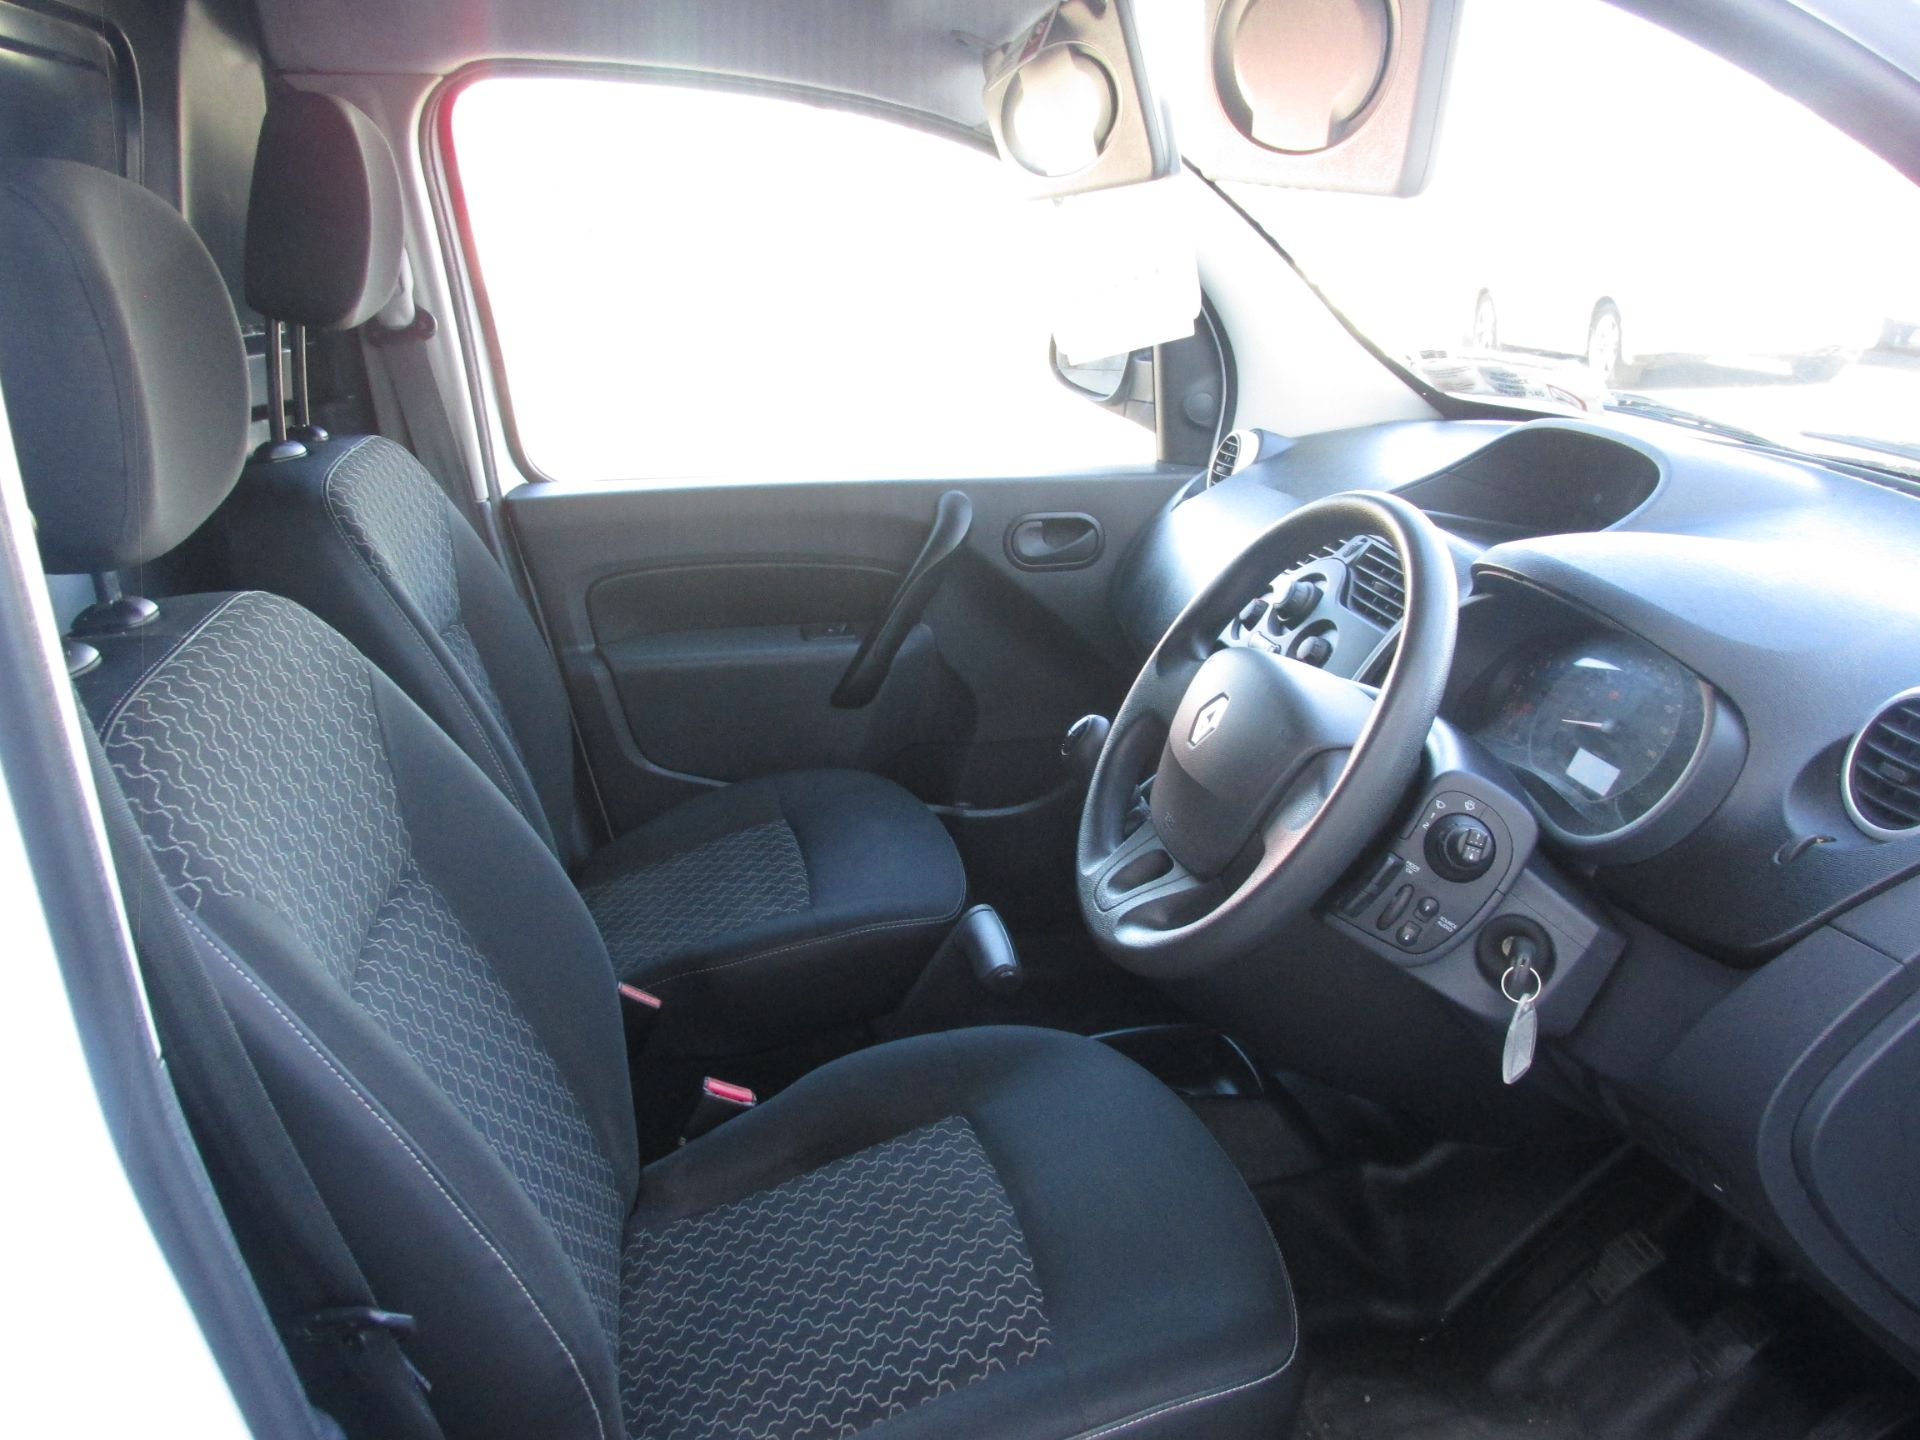 2015 Renault Kangoo 1.5 DCI 90BHP 2015 2DR (152D18874) Image 12